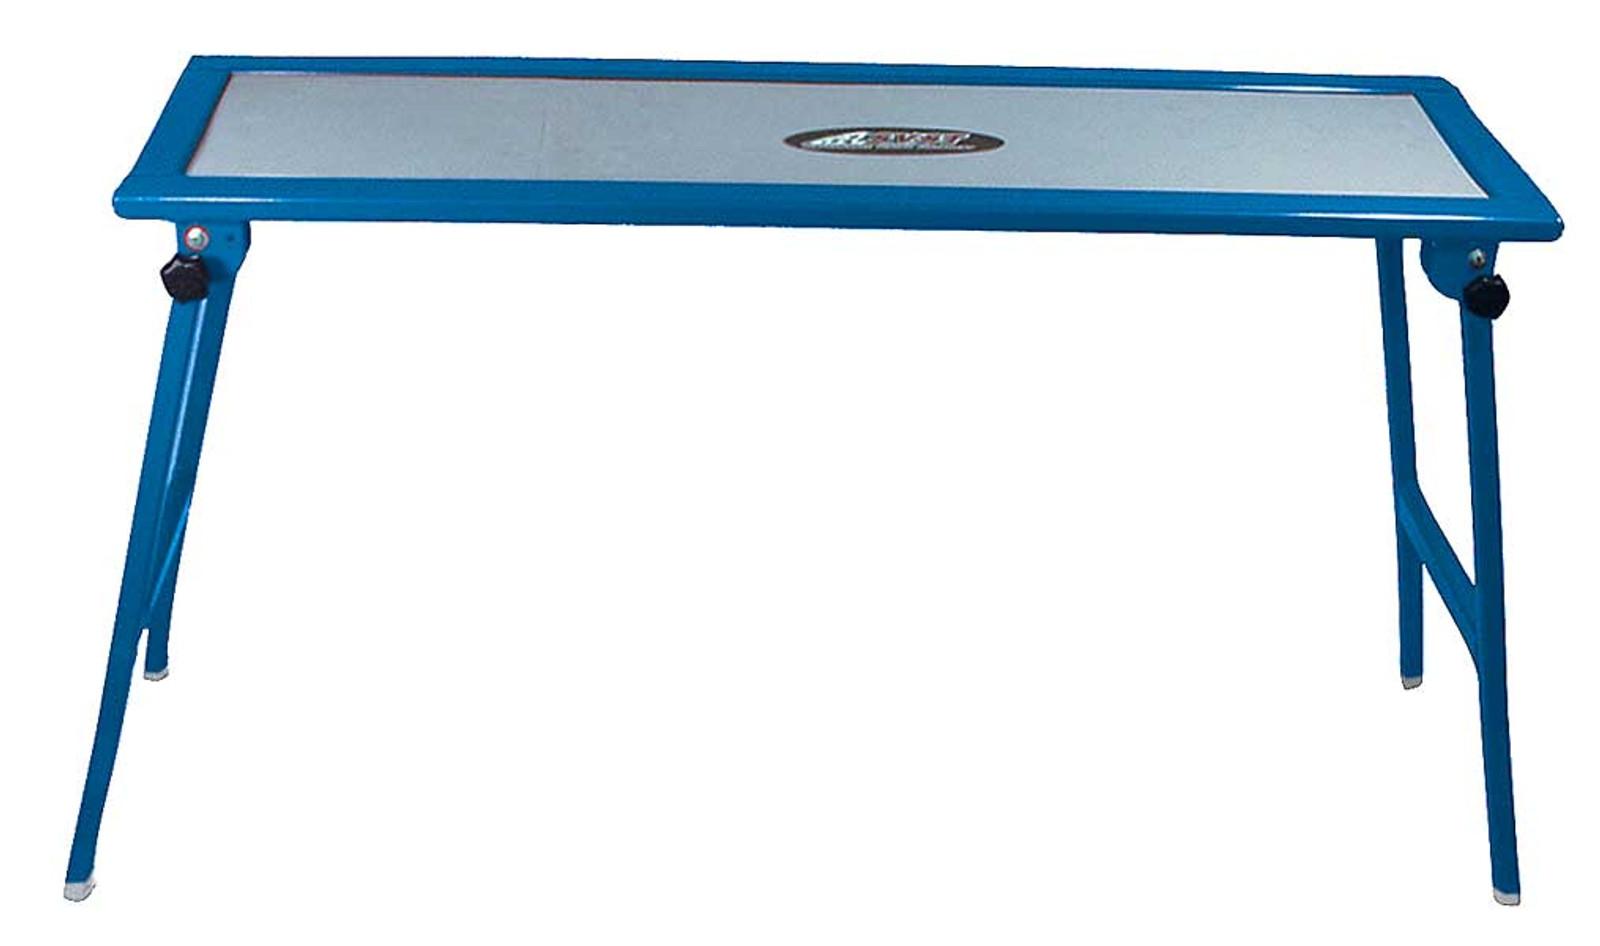 SVST Portable Tuning Bench